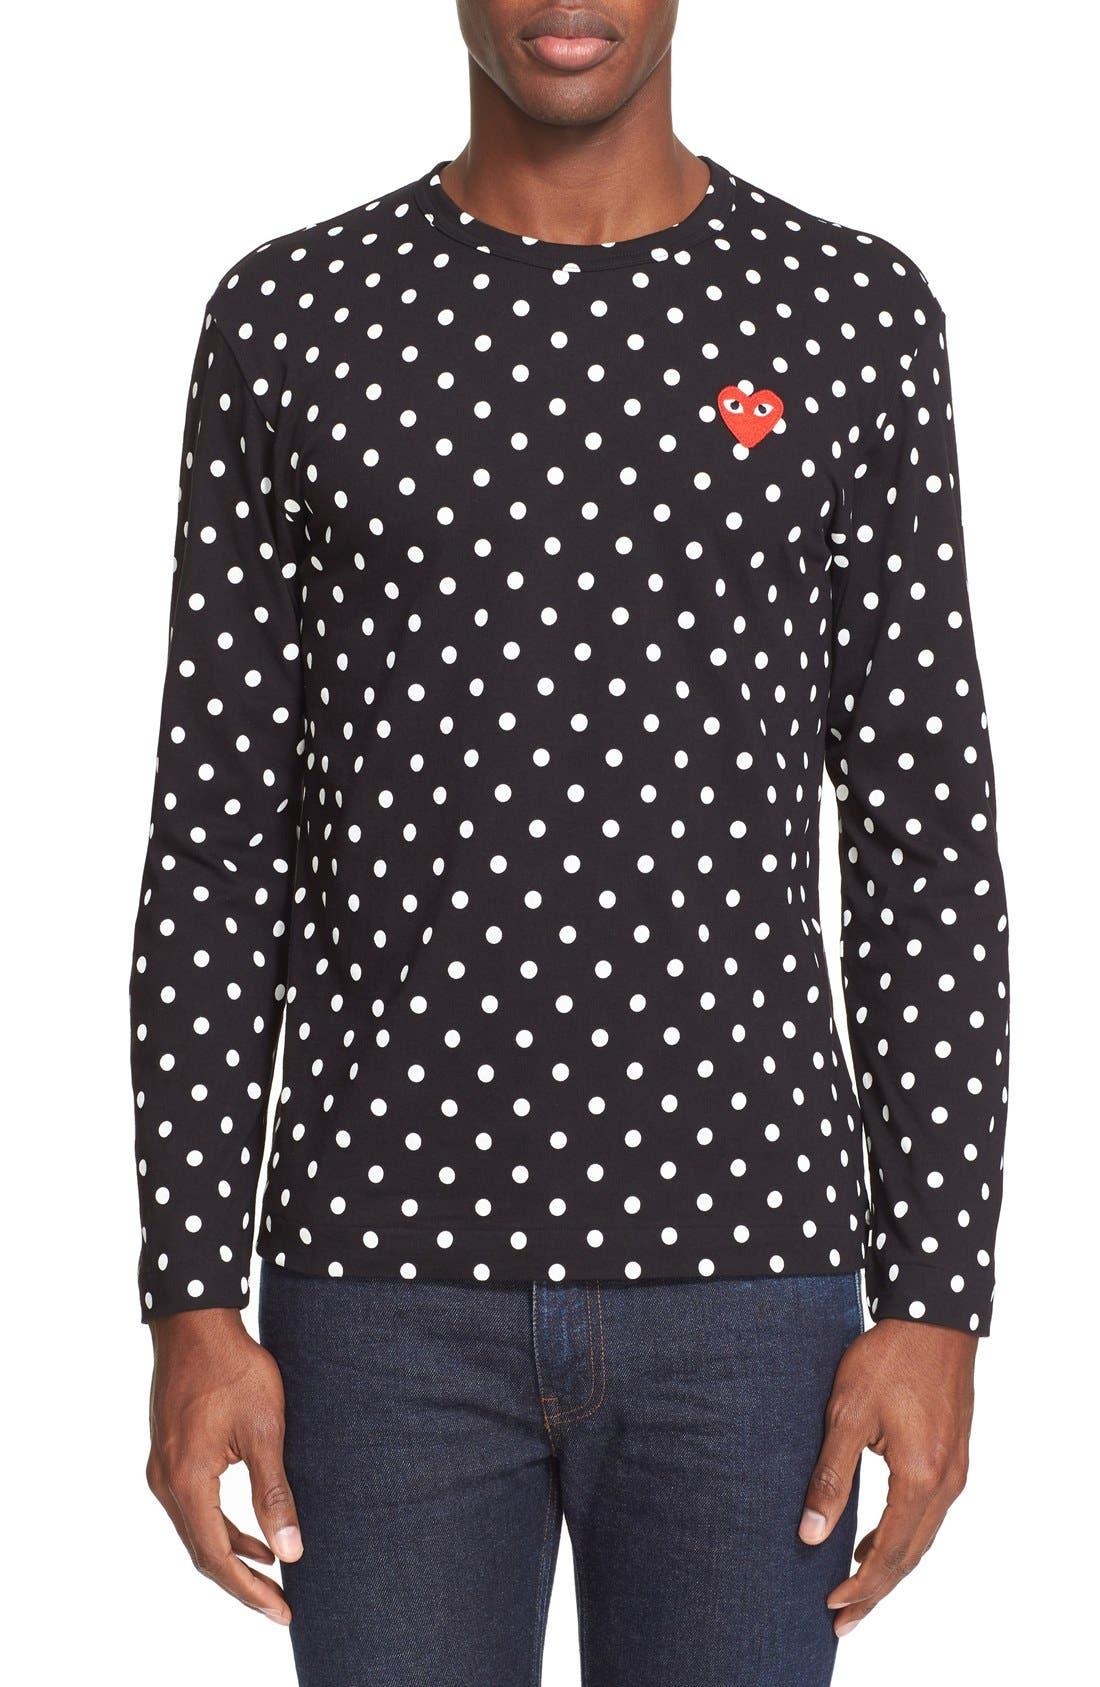 Alternate Image 1 Selected - Comme des Garçons PLAY Dot Print Long Sleeve Crewneck T-Shirt